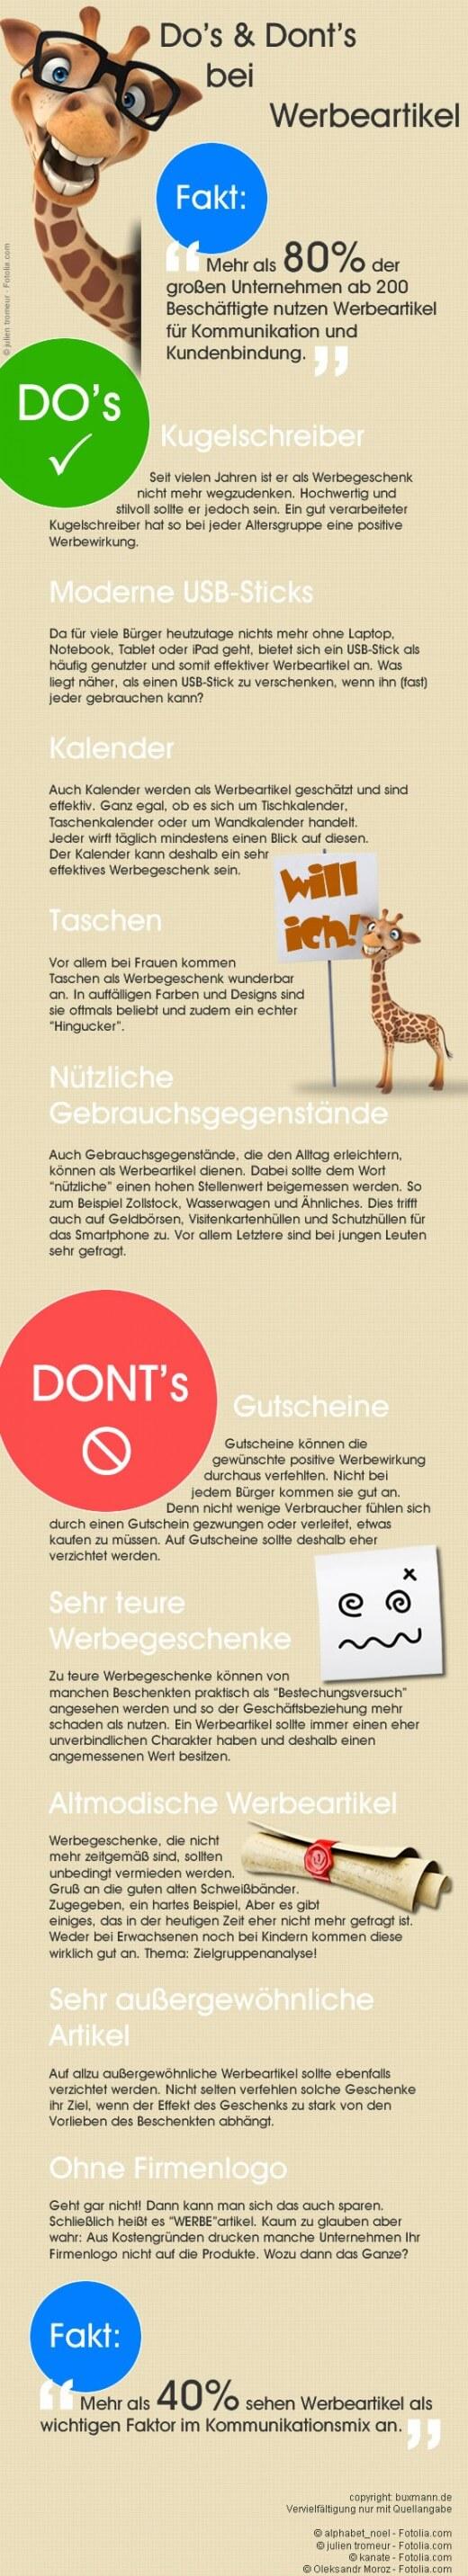 infografik_werbeartikel_2013-09-24